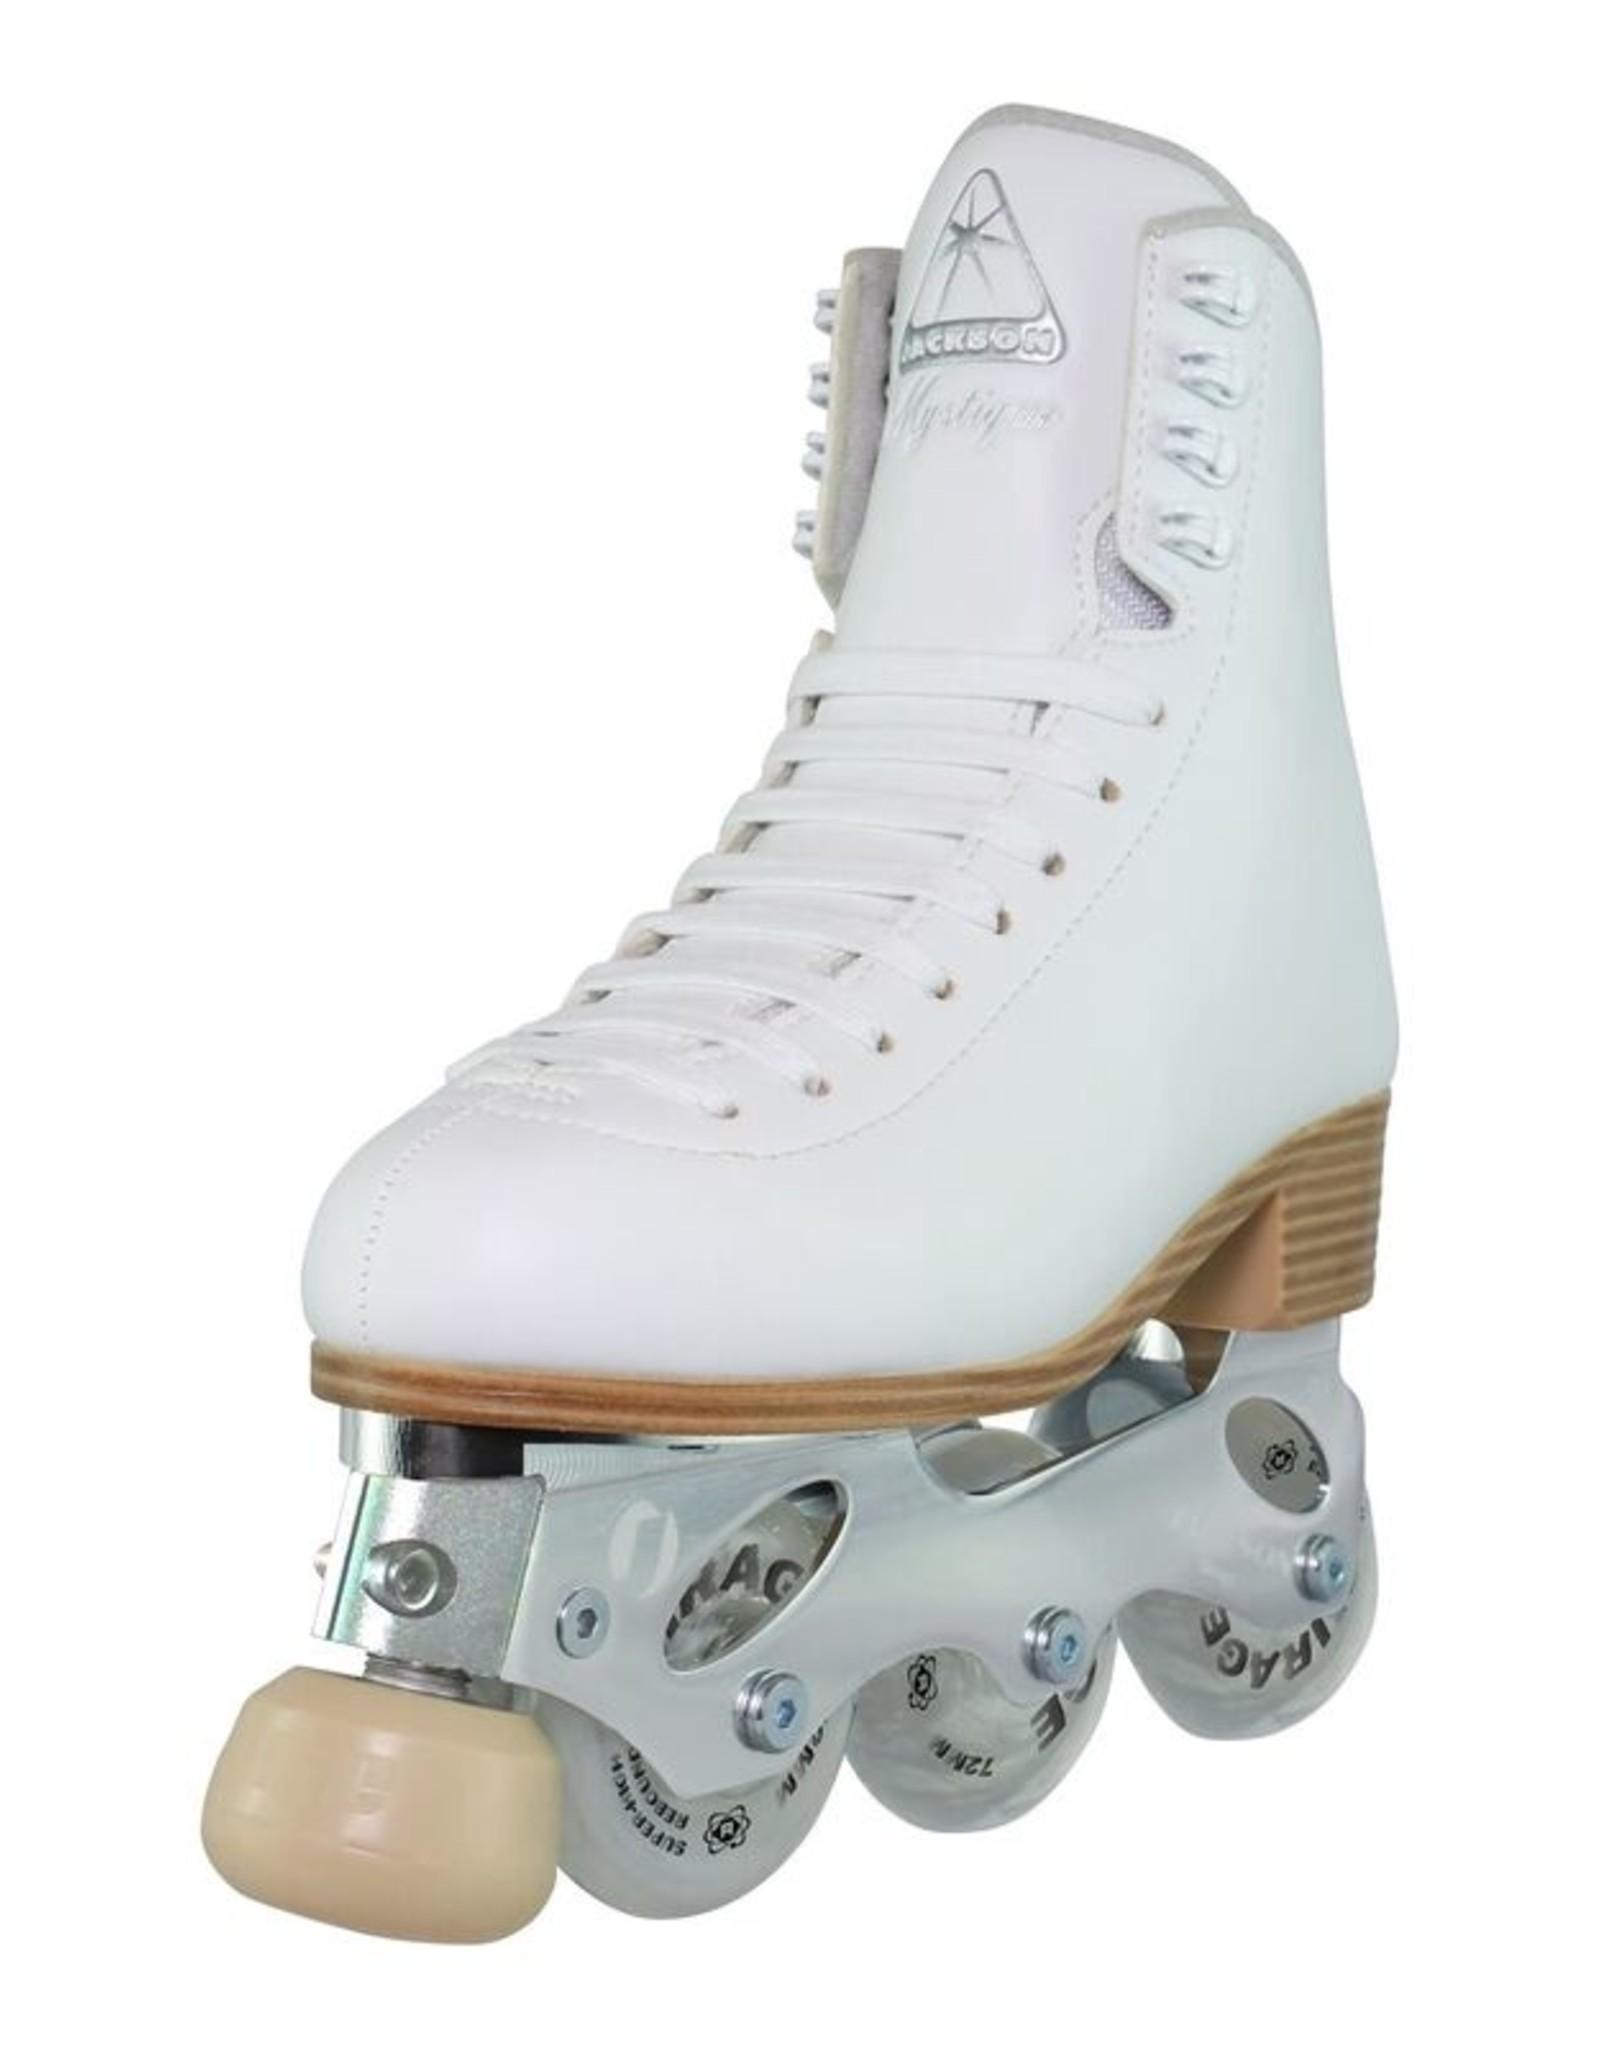 Jackson Mirage Frame Inline Skates (only Frame)